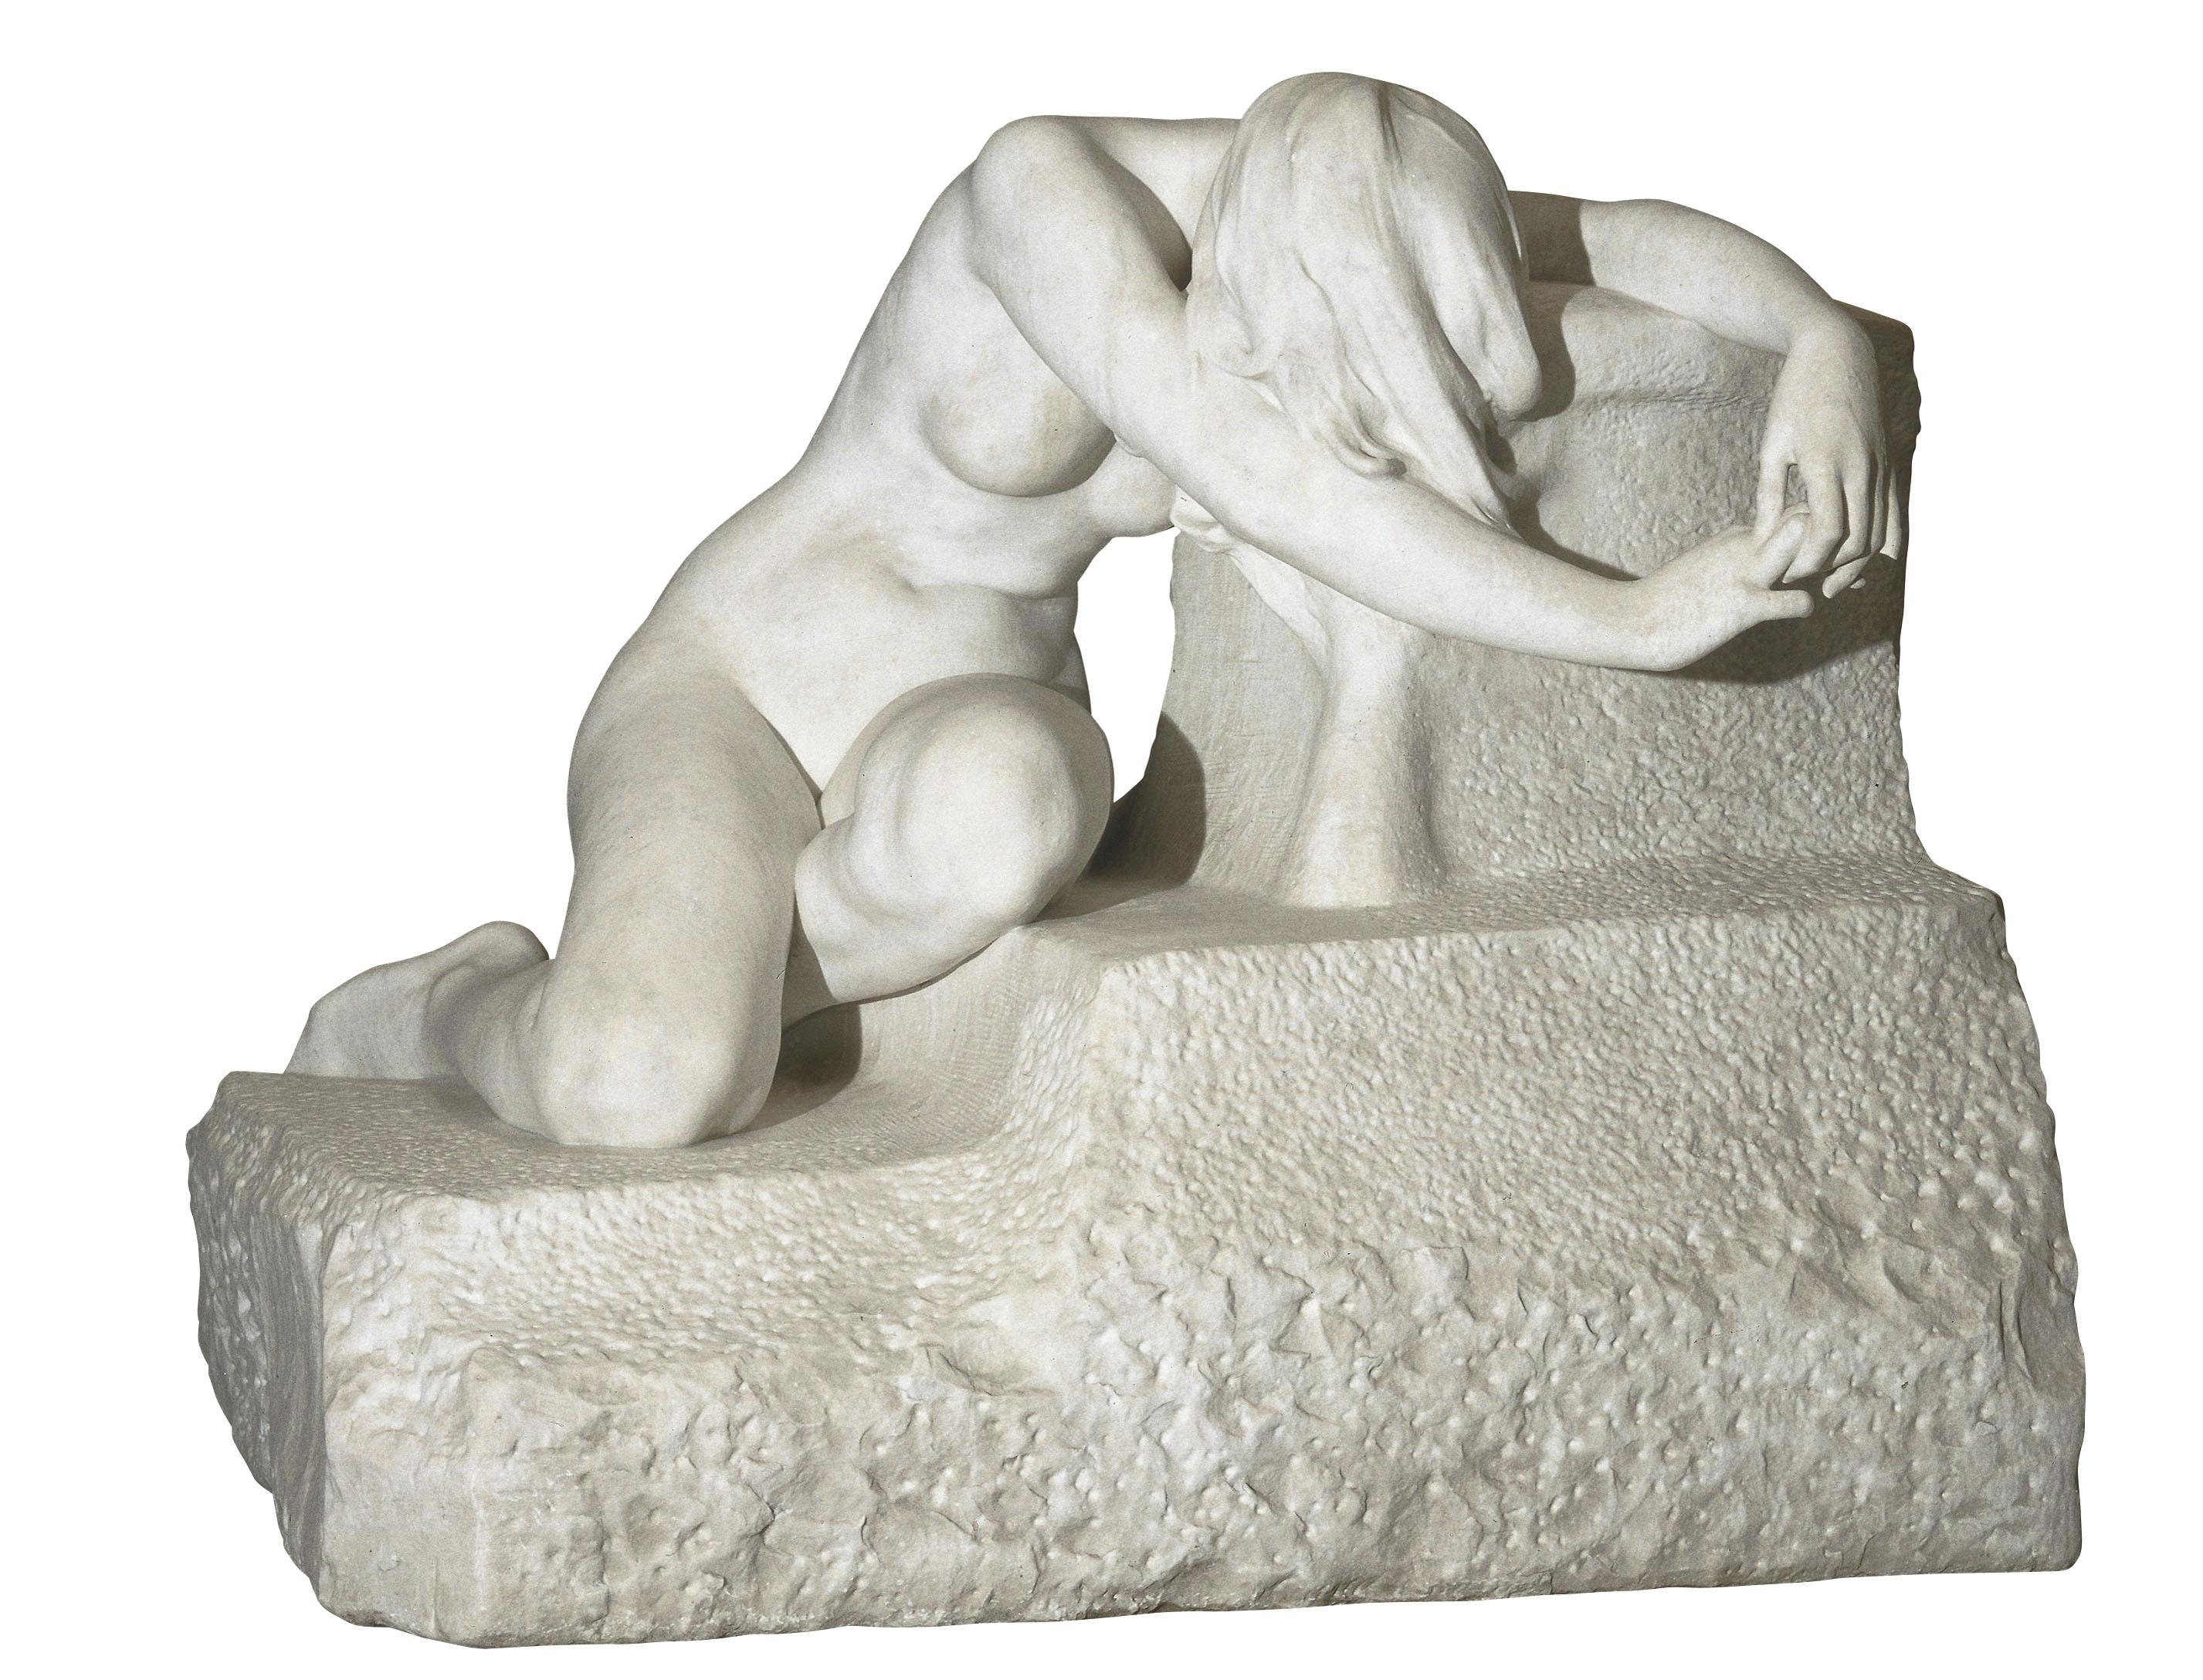 Josep Llimona, Desolation, 1907